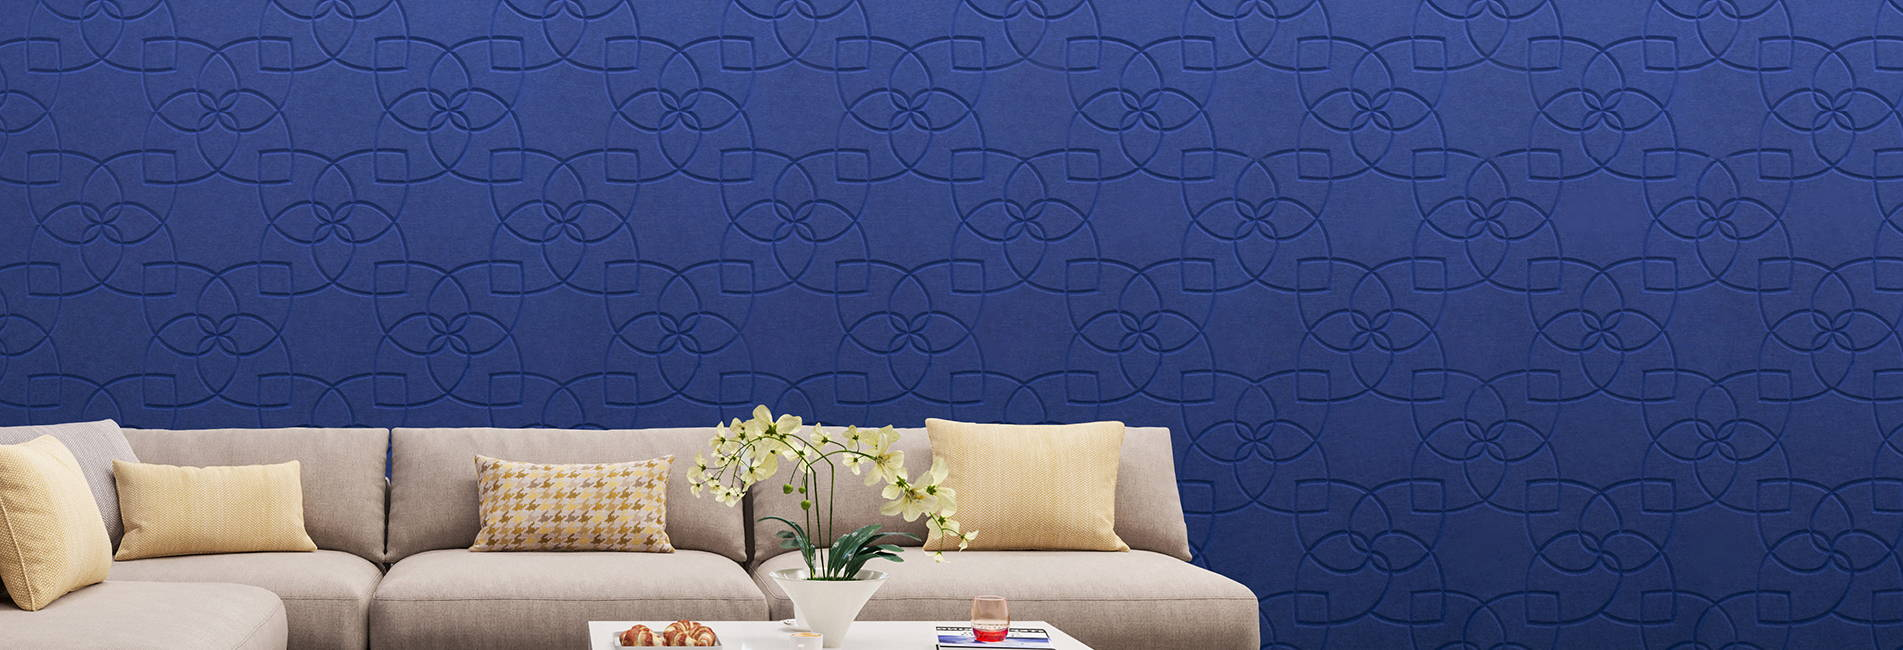 blue ora v links pattern